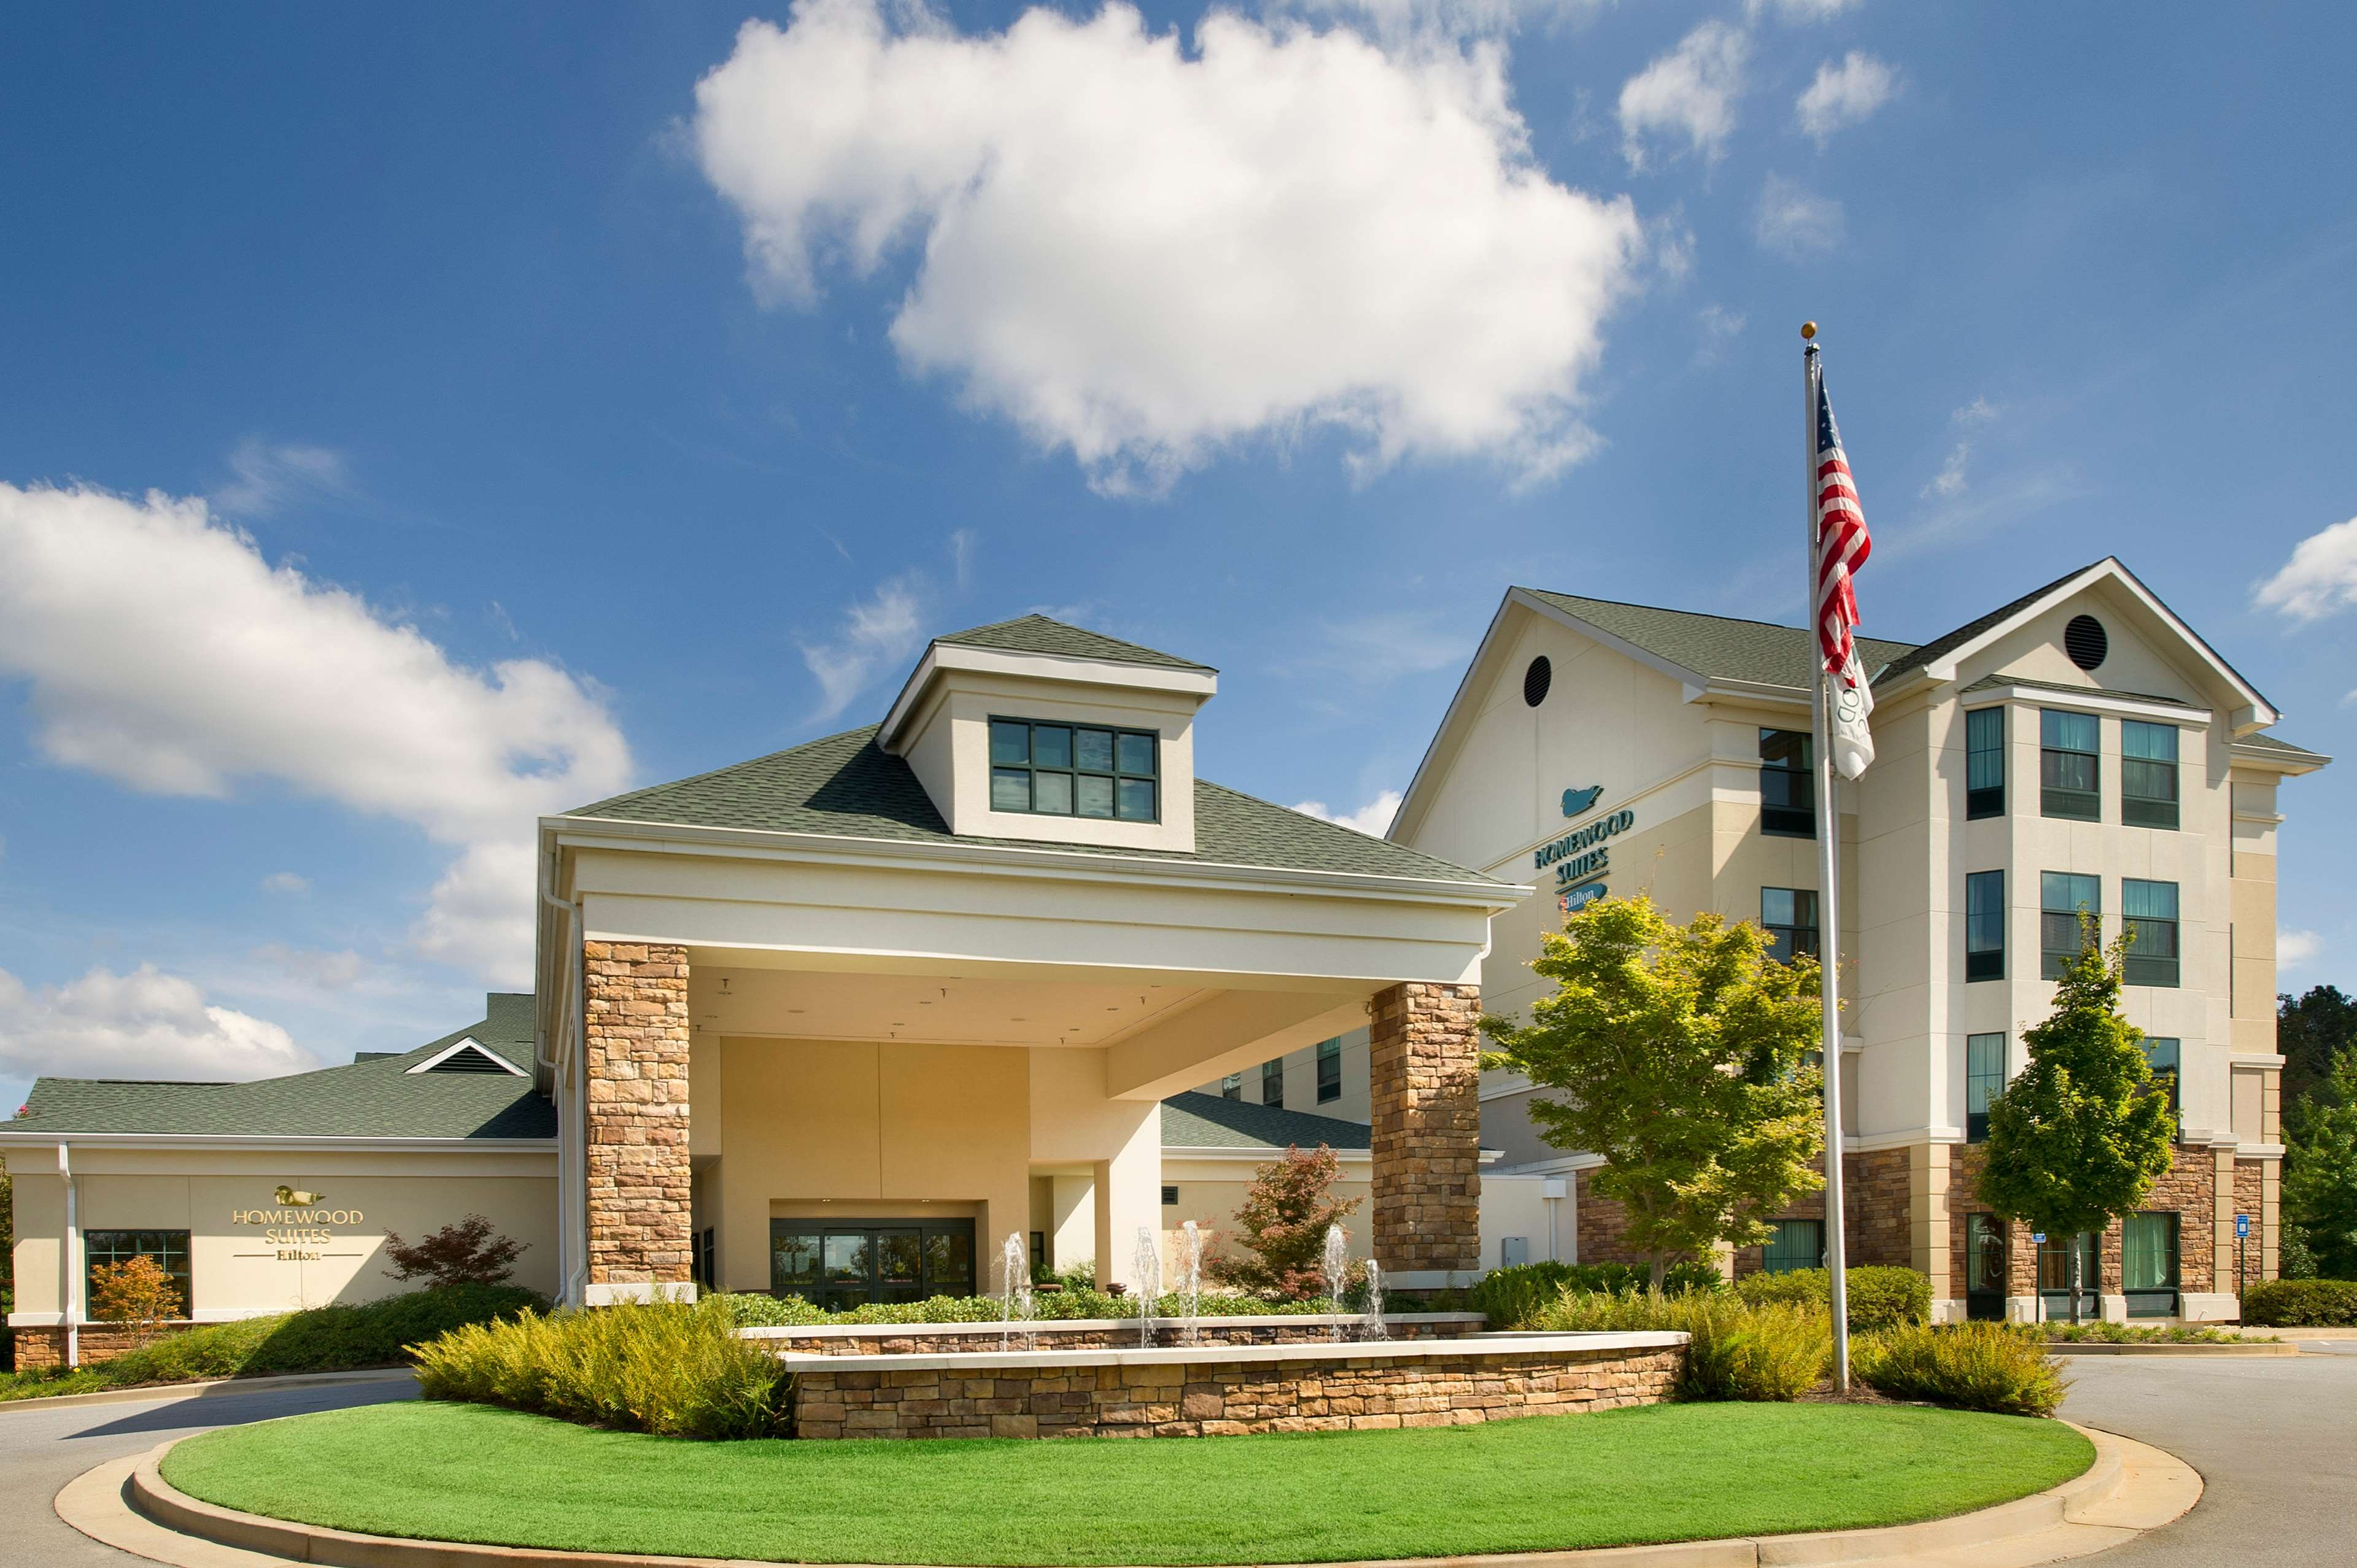 Homewood Suites by Hilton Columbus image 3